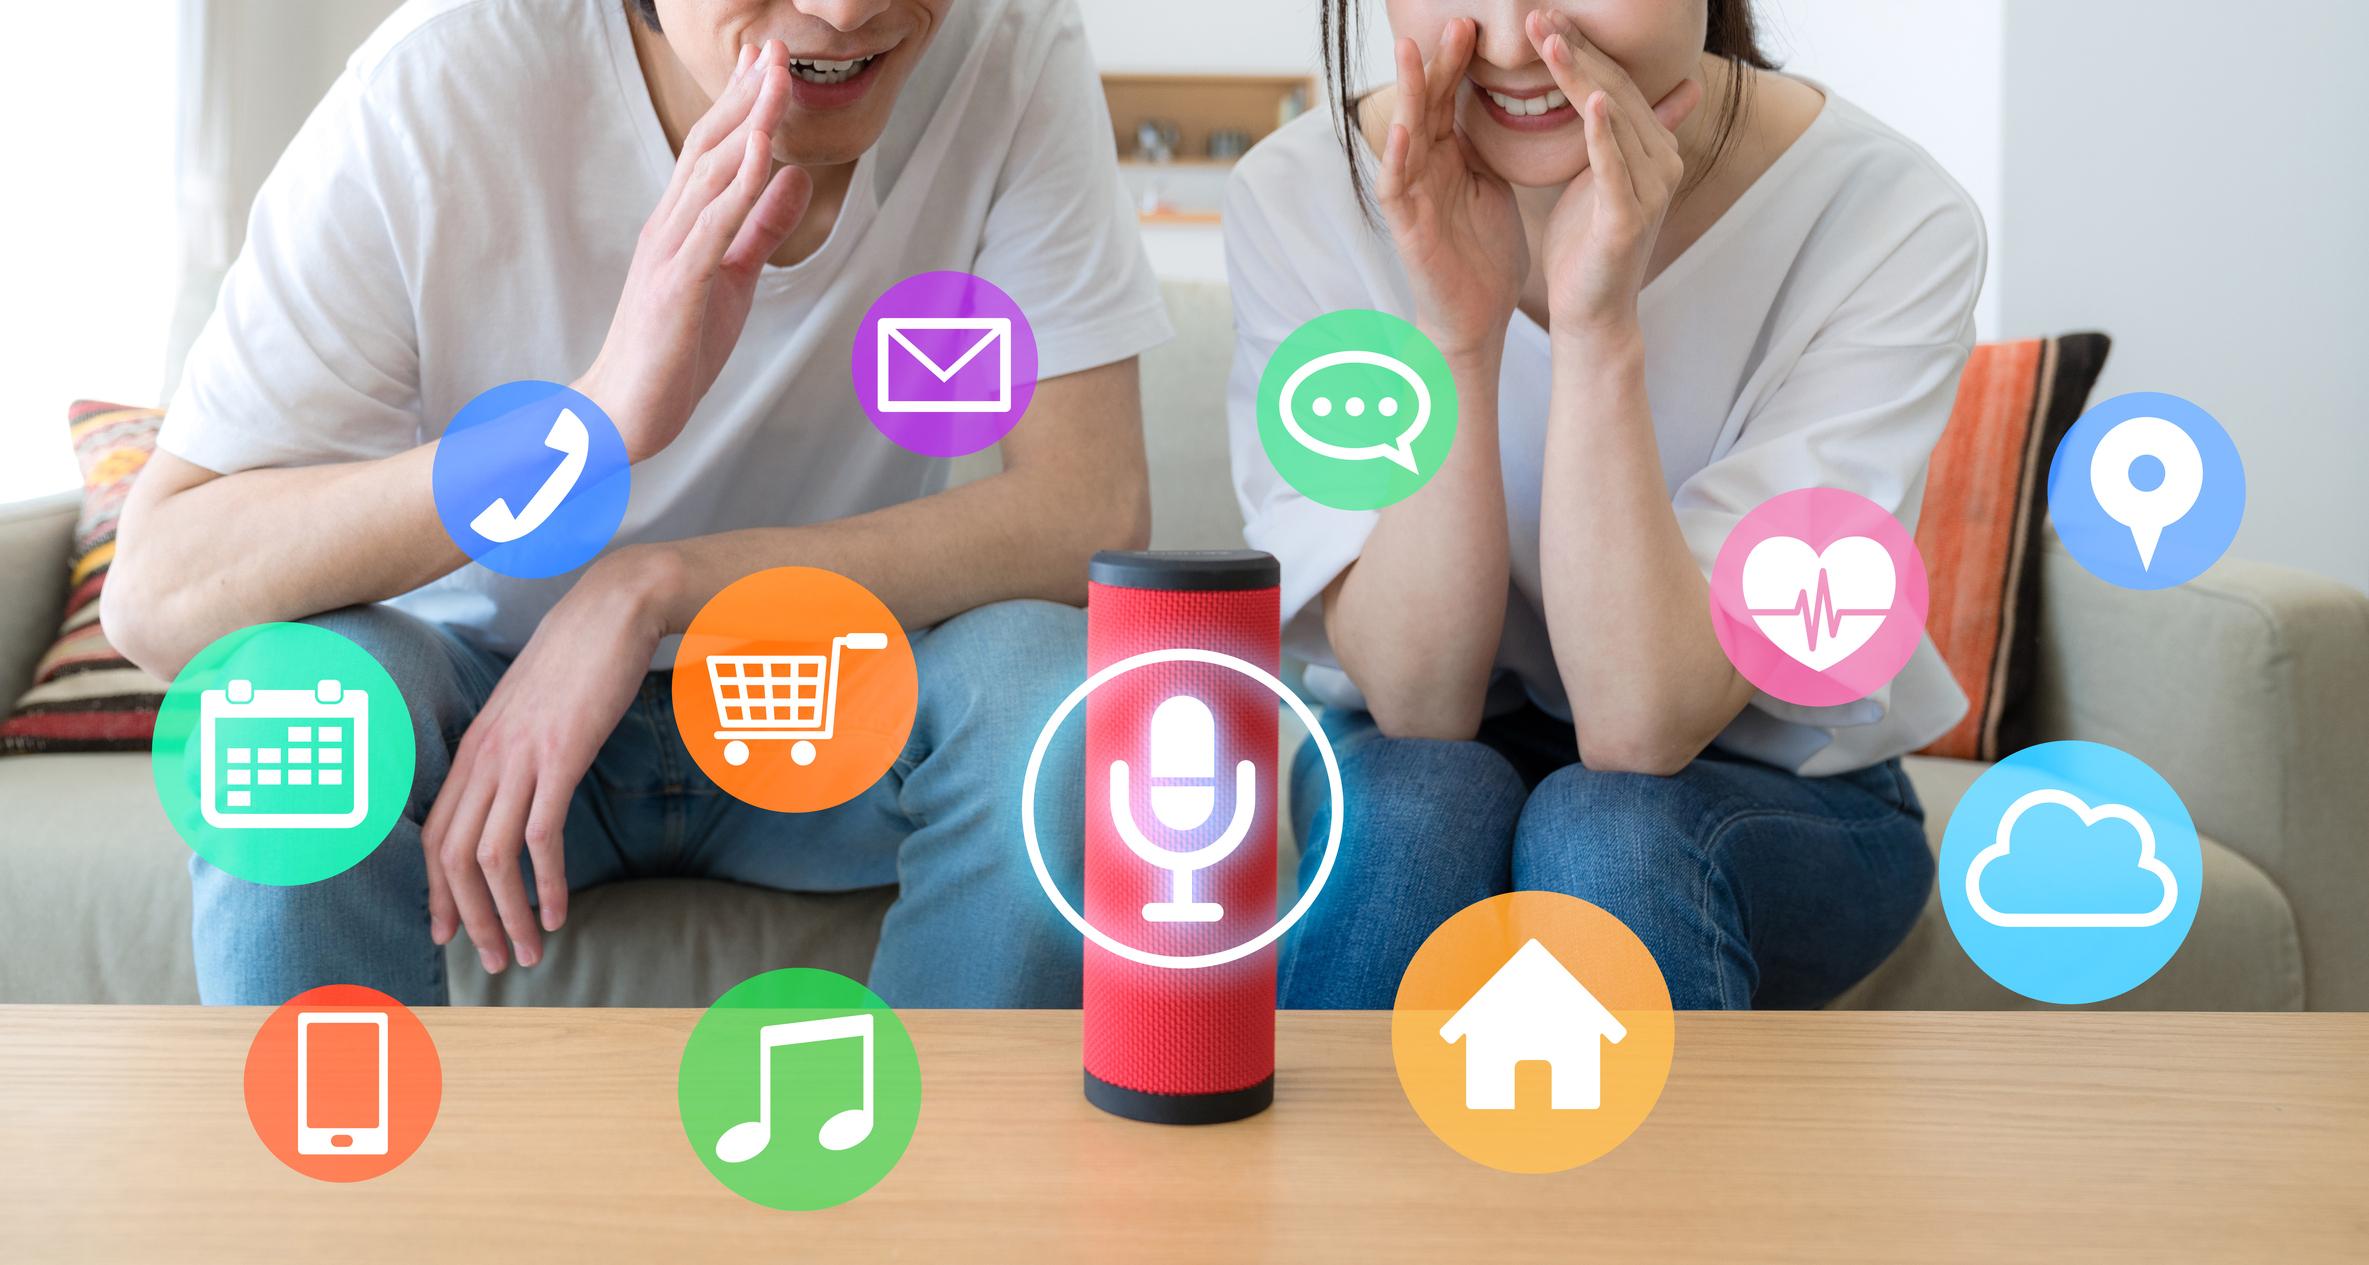 What is the Amazon Alexa and Yext partnership?